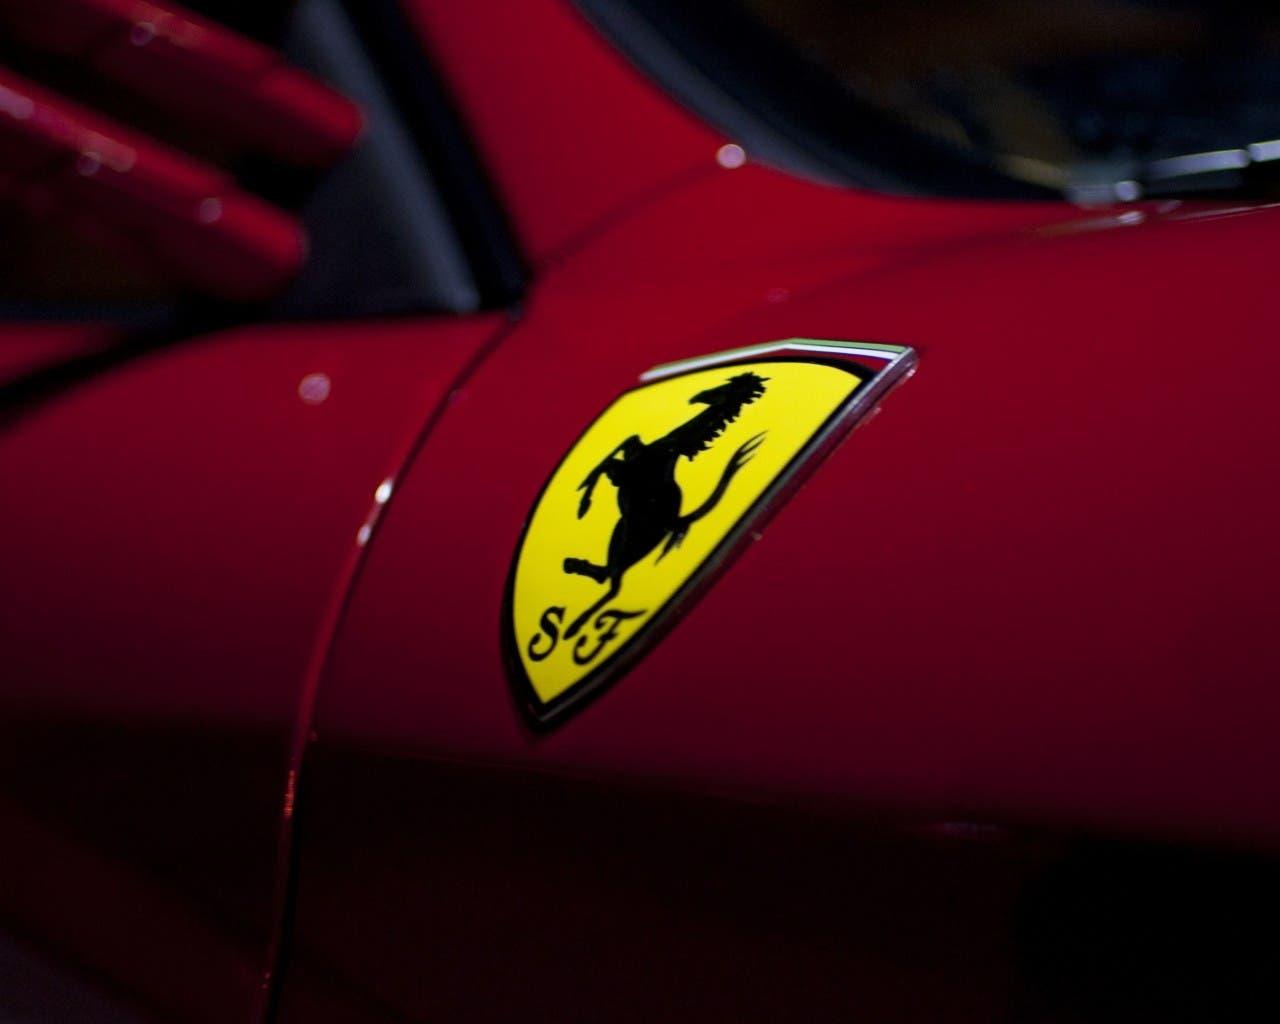 Ferrari Maserati Salone auto Parigi